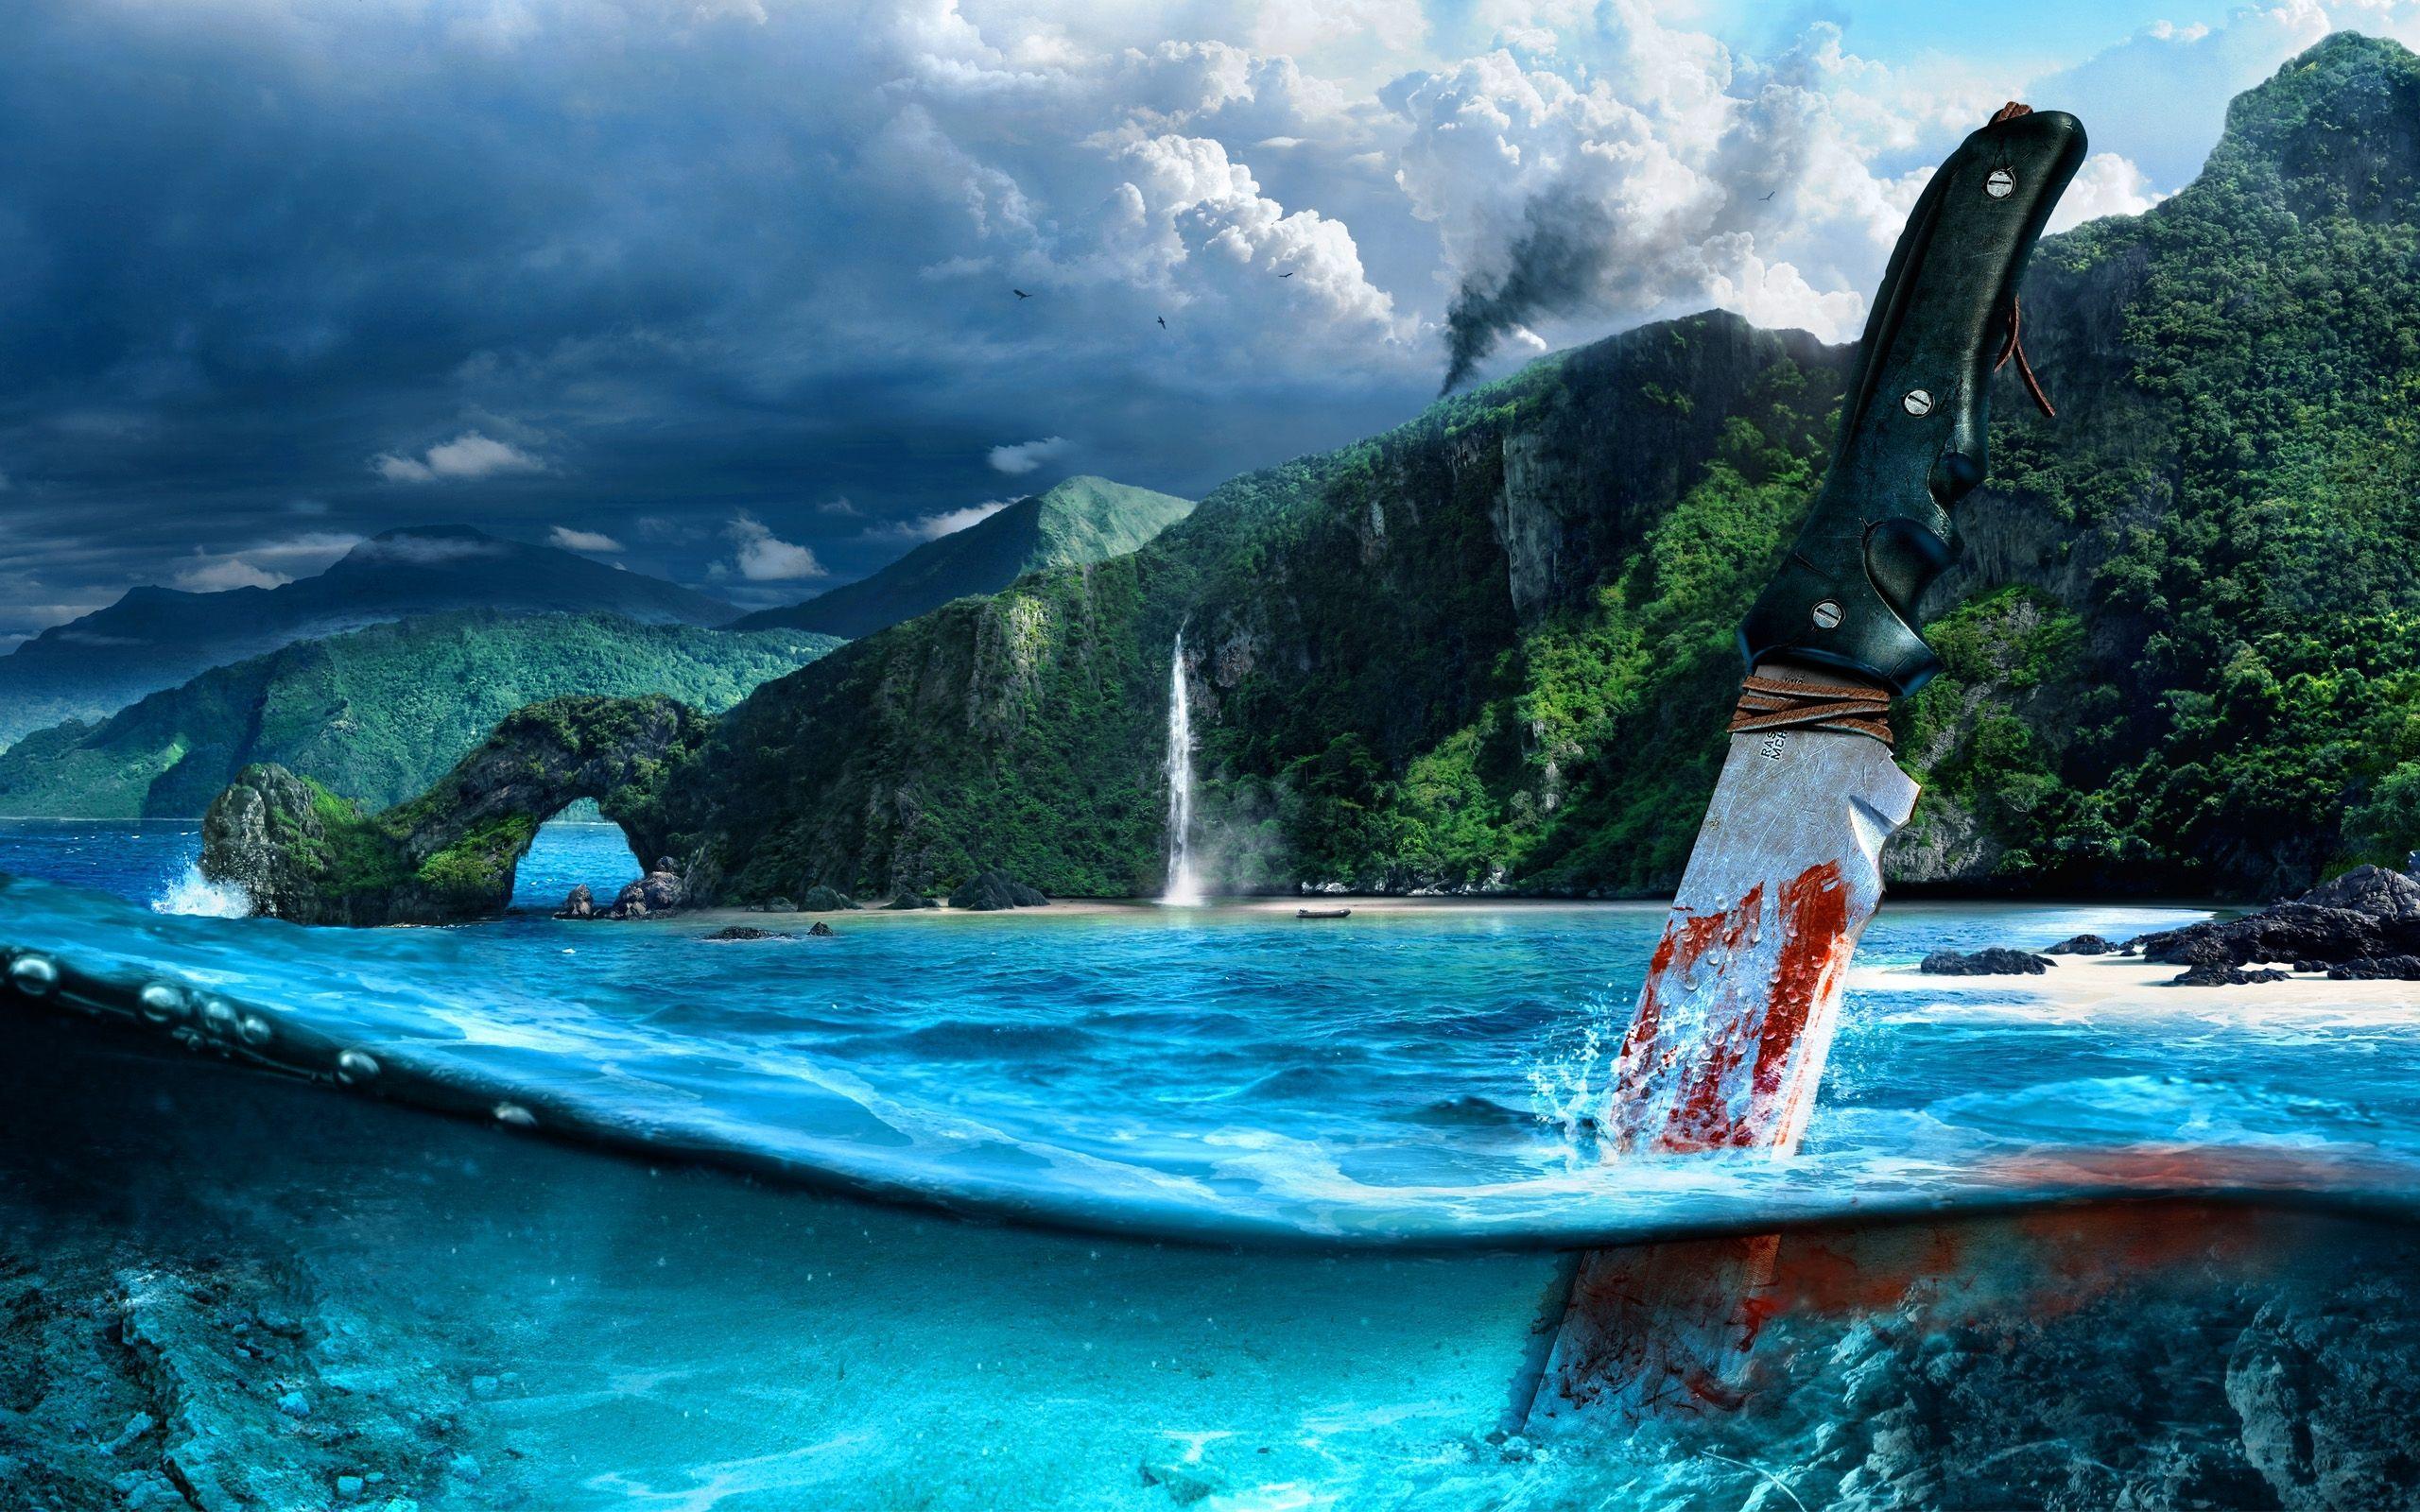 10 Top Far Cry 3 Wallpaper Full Hd 1080p For Pc Desktop Far Cry 3 Widescreen Wallpaper Backgrounds Desktop